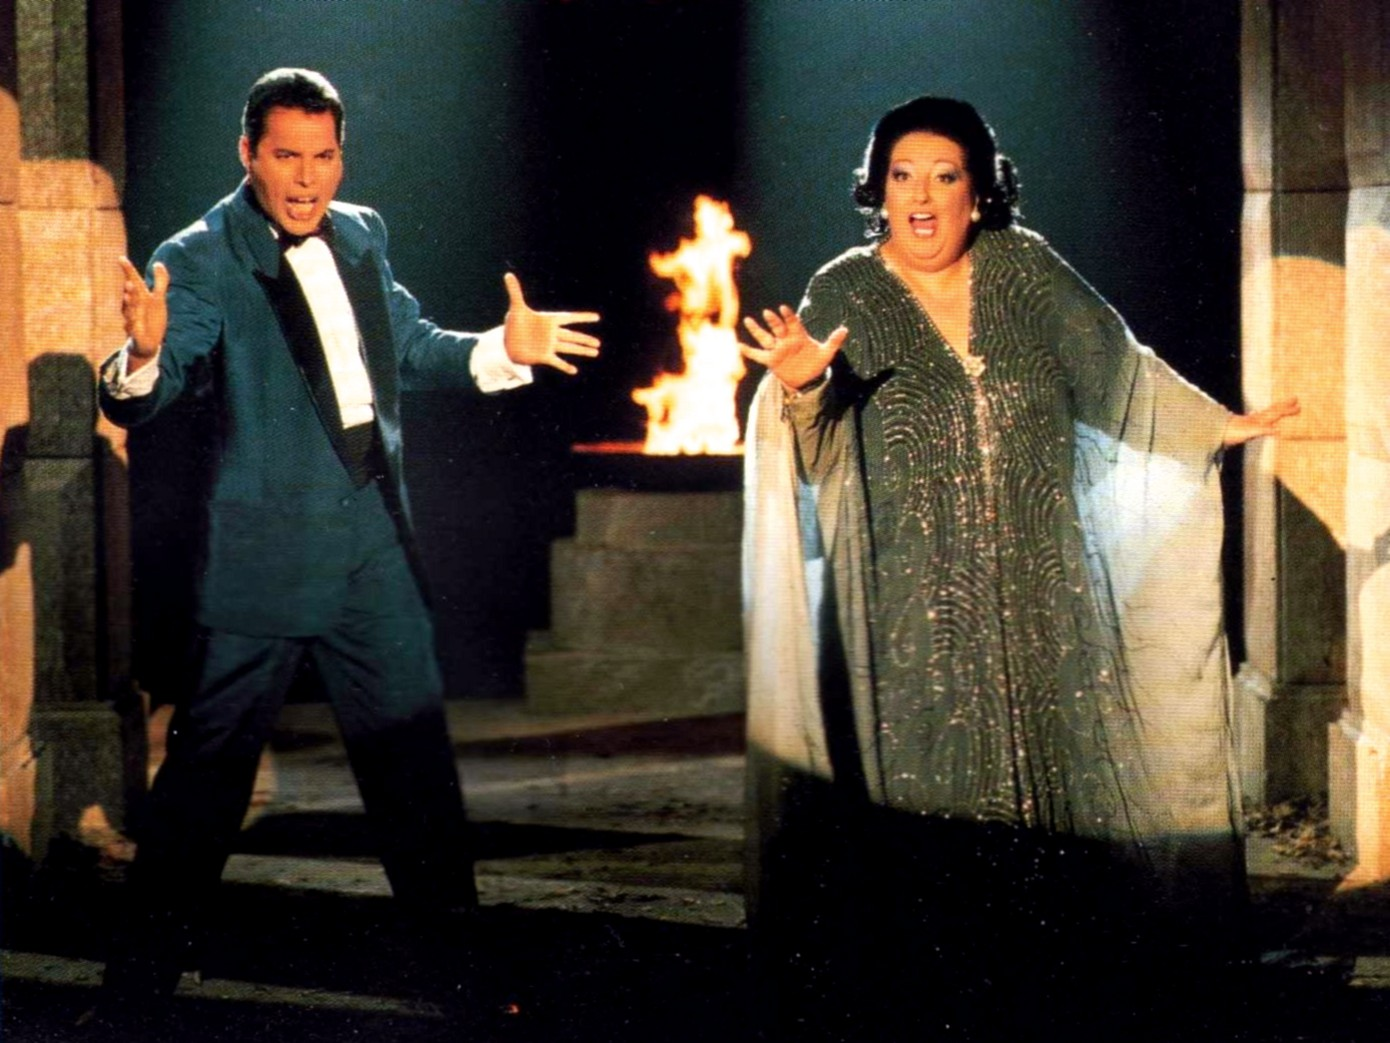 Фредди Меркьюри и Монсеррат Кабалье исполняют песню «Барселона»